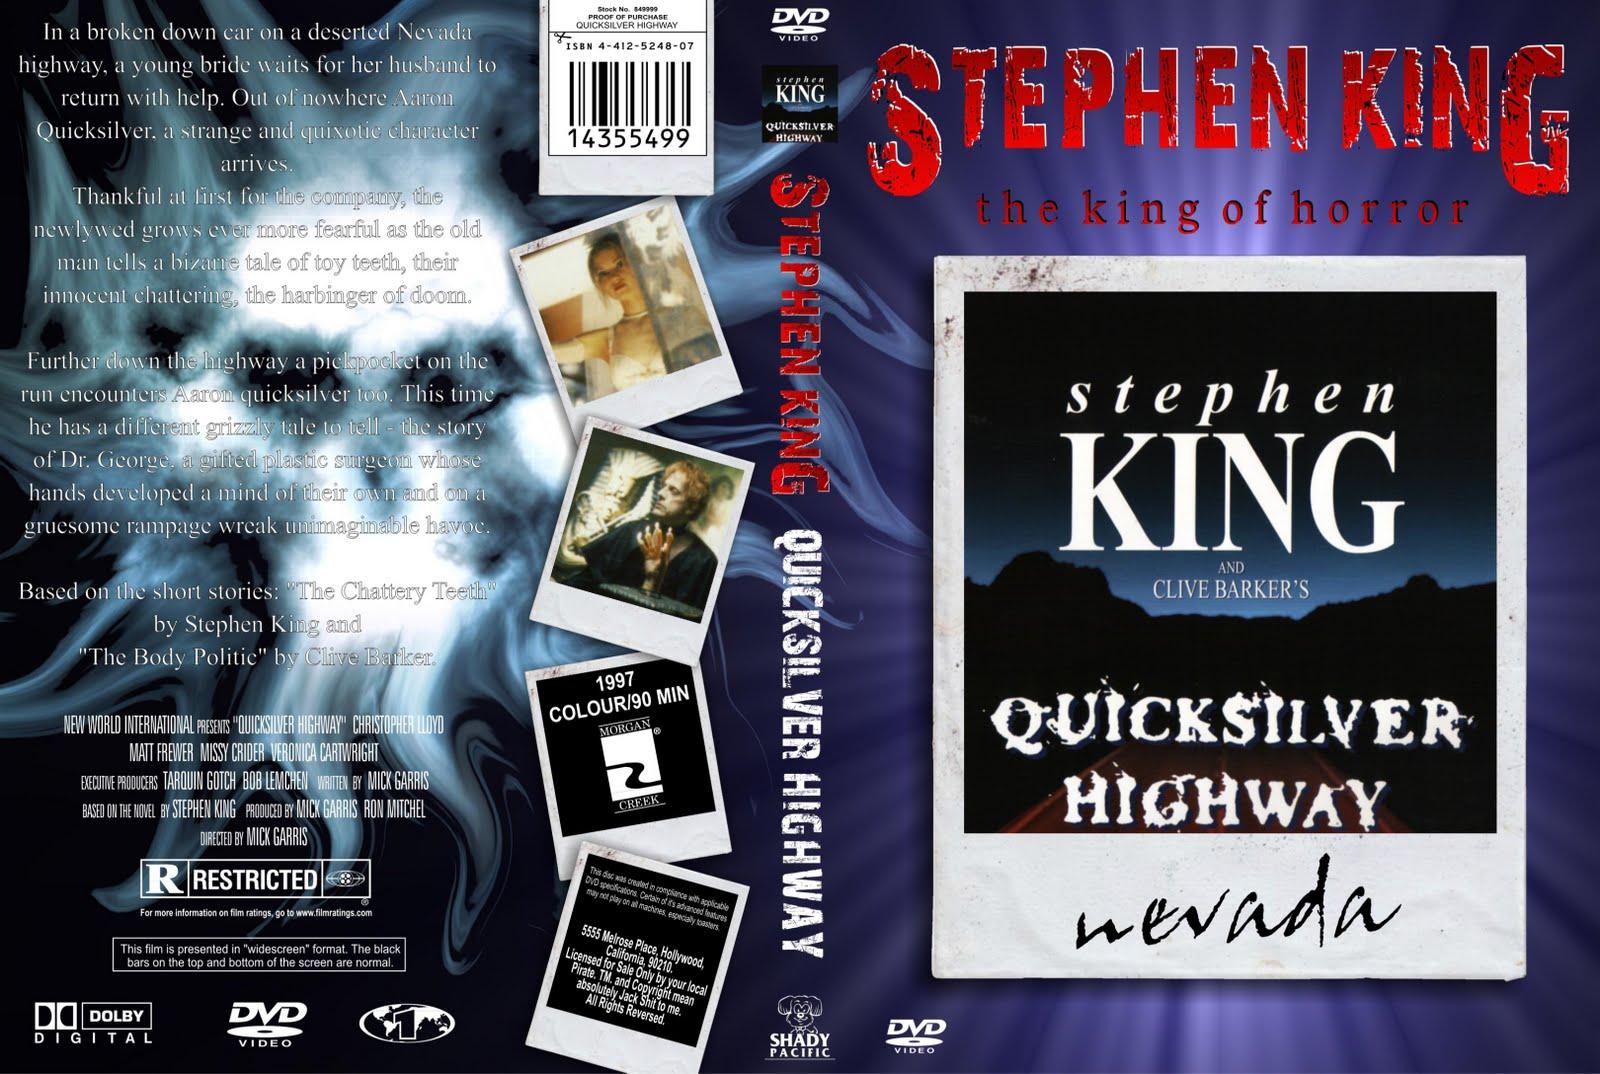 http://1.bp.blogspot.com/_1oiczSBcSZ0/TFr58HcUXRI/AAAAAAAAAlw/I4ztkyCFM_A/s1600/Stephen_king_s_Quicksilver_Highway.jpg